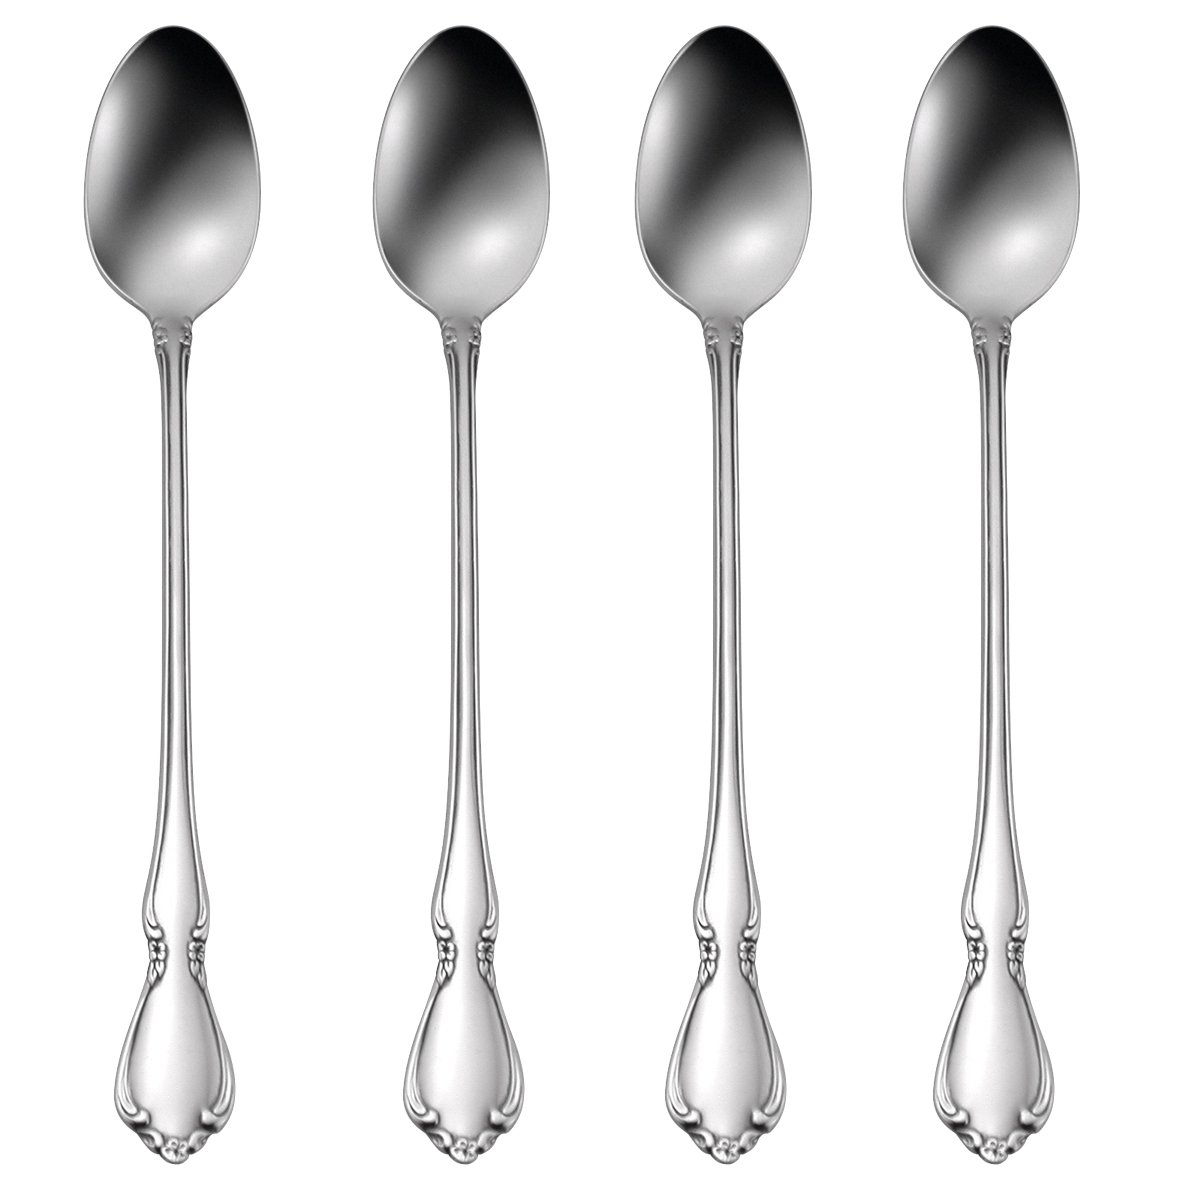 Oneida Chateau Iced Tea Spoons, Set of 4